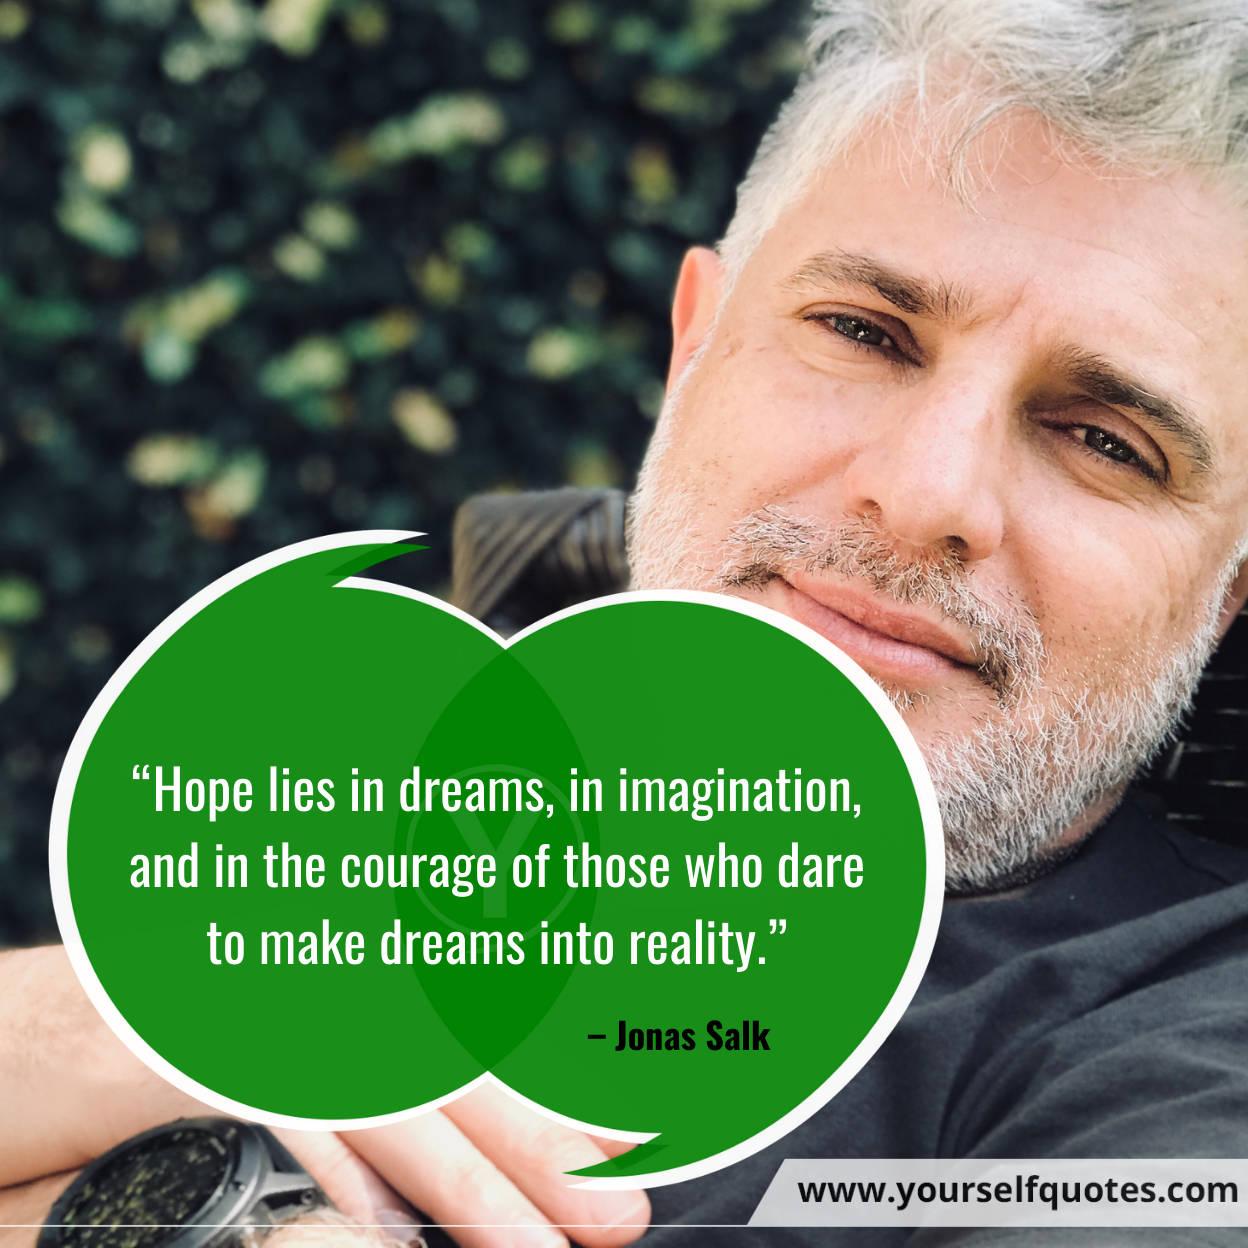 Quotes on Dream by Jonas Salk